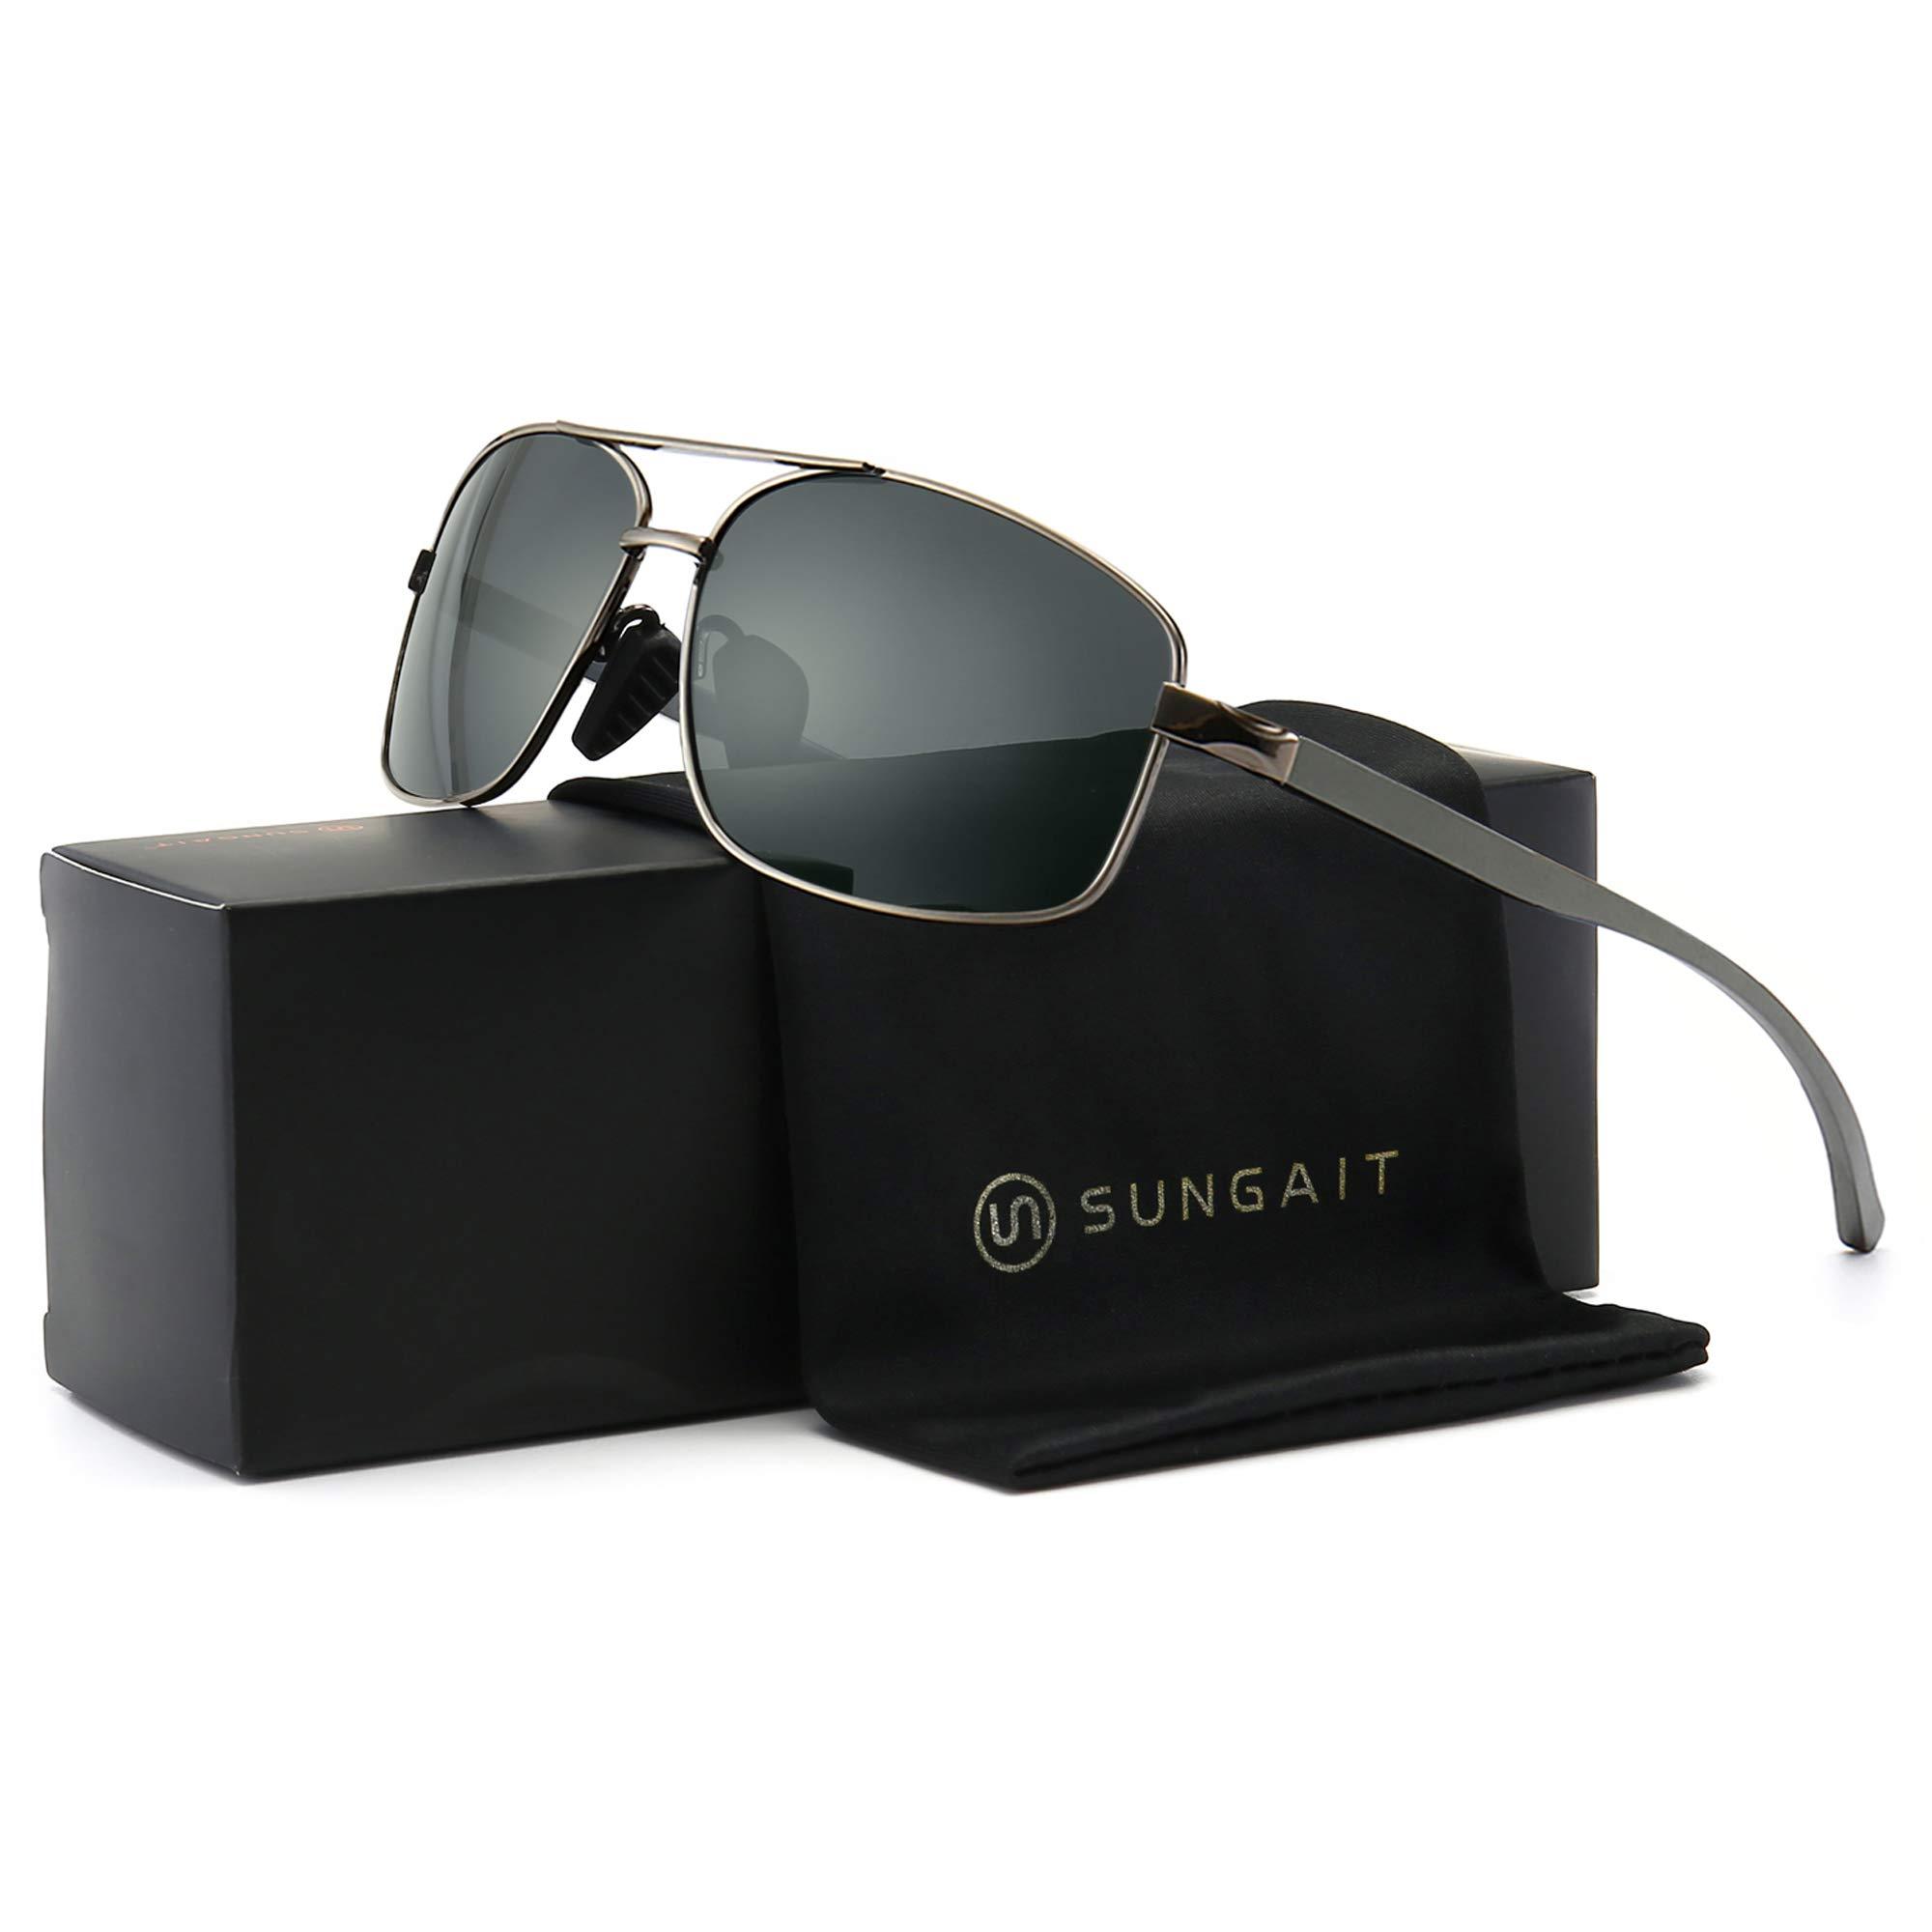 SUNGAIT Ultra Lightweight Rectangular Polarized Sunglasses UV400 Protection (Gunmetal Frame Gray Lens, 62) Metal Frame 2458 QKH by SUNGAIT